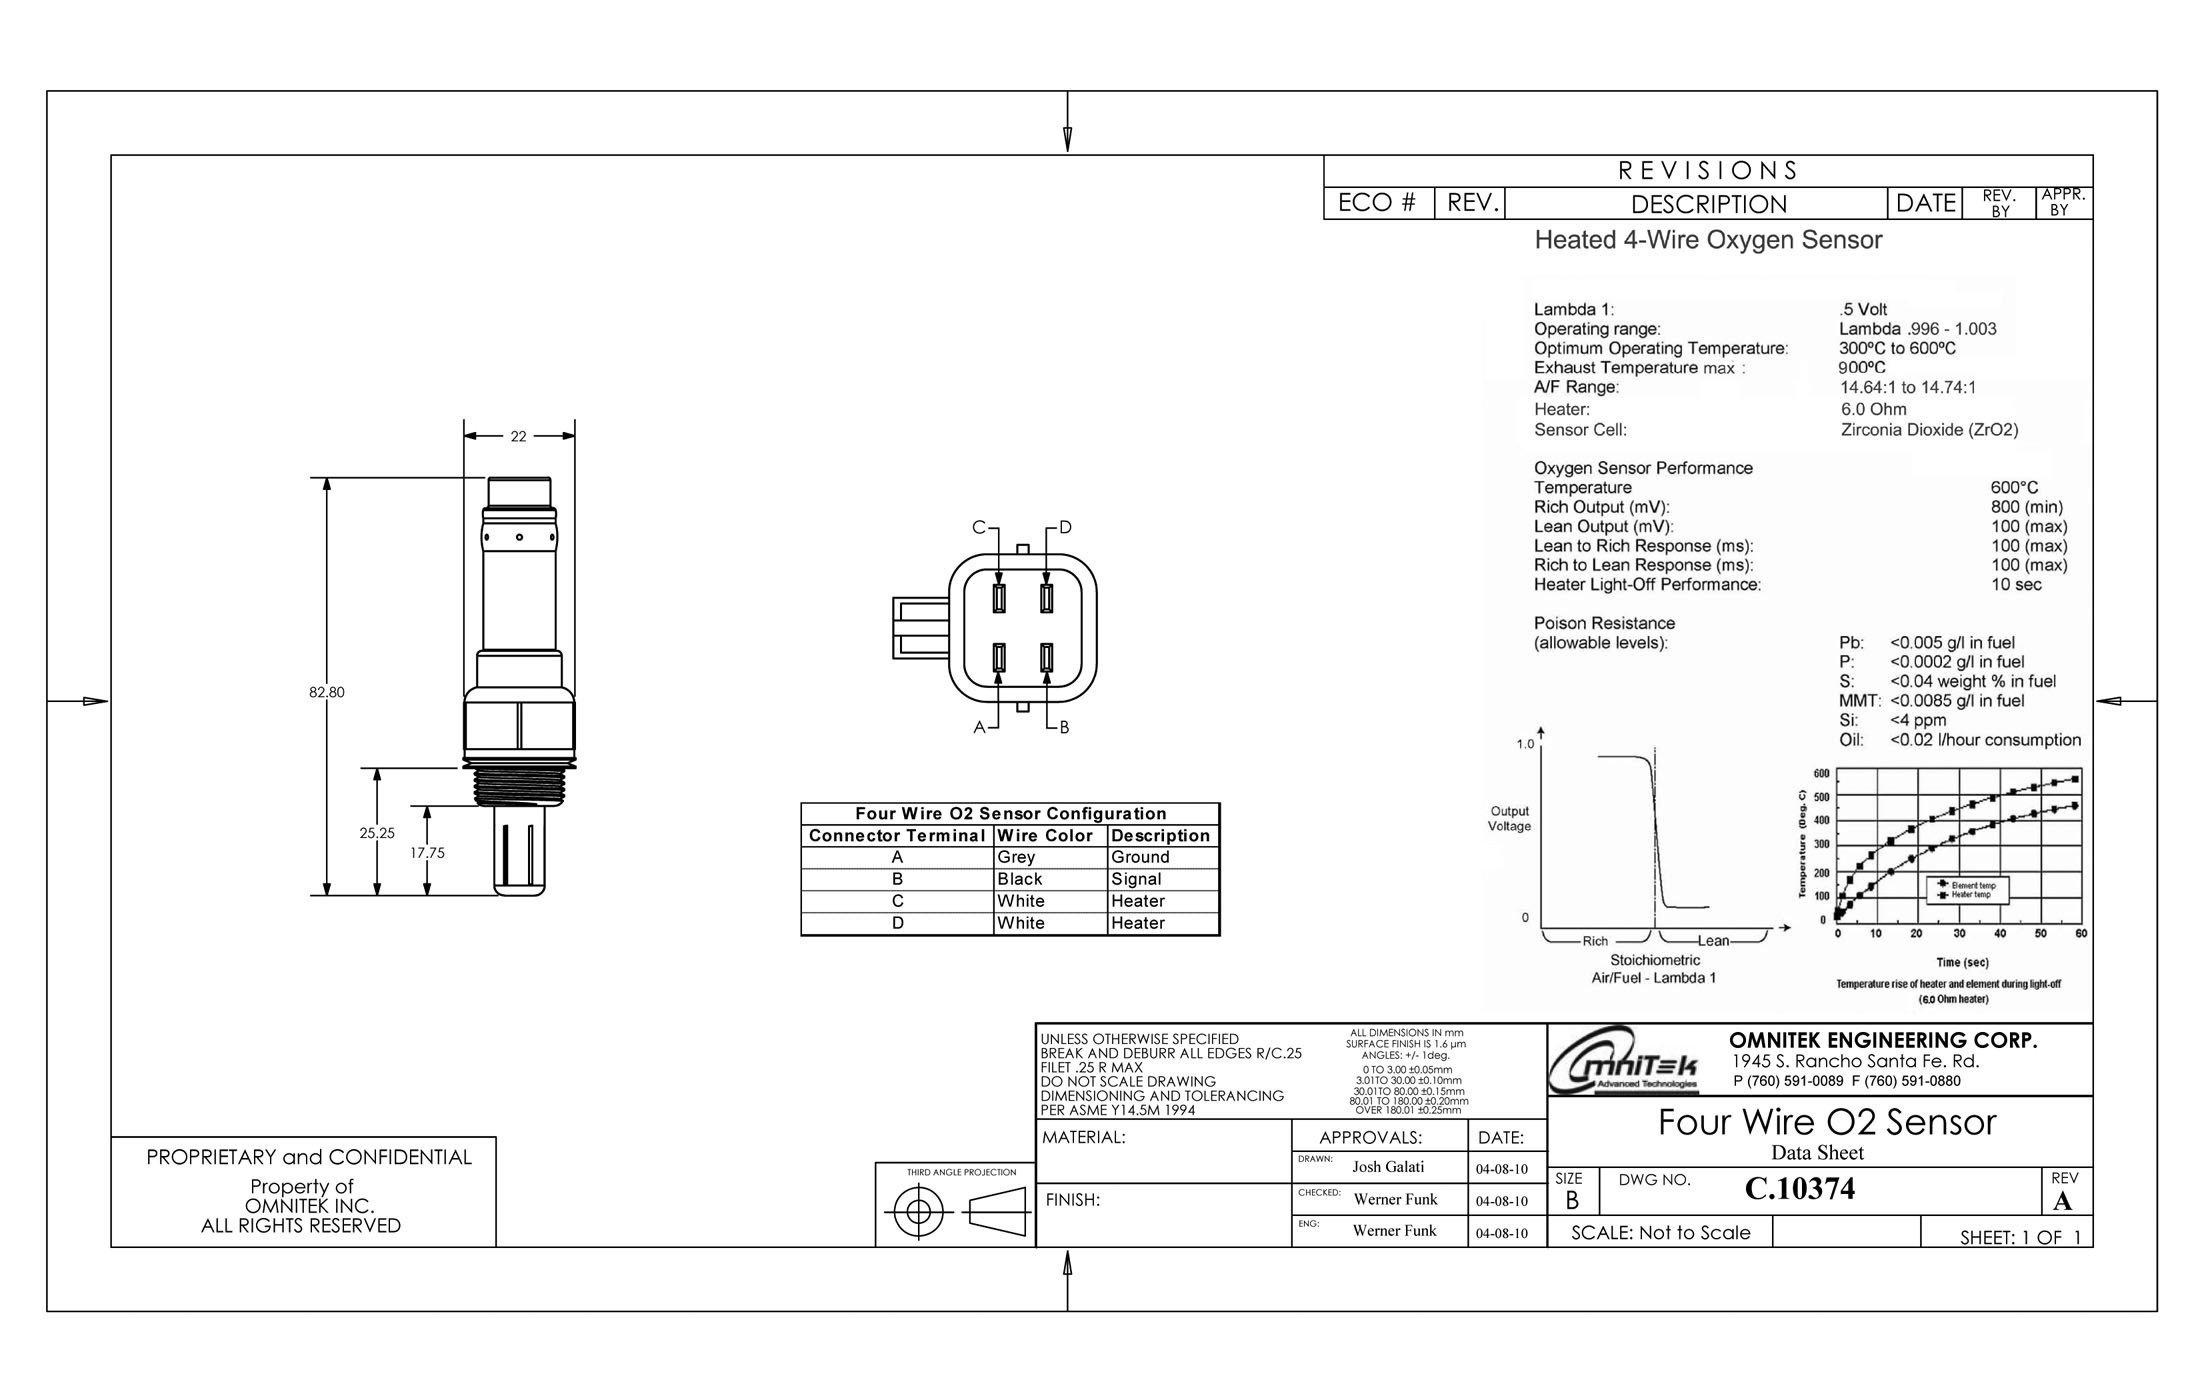 4 Wire O2 Diagram | Wiring Library - 4 Wire Oxygen Sensor Wiring Diagram